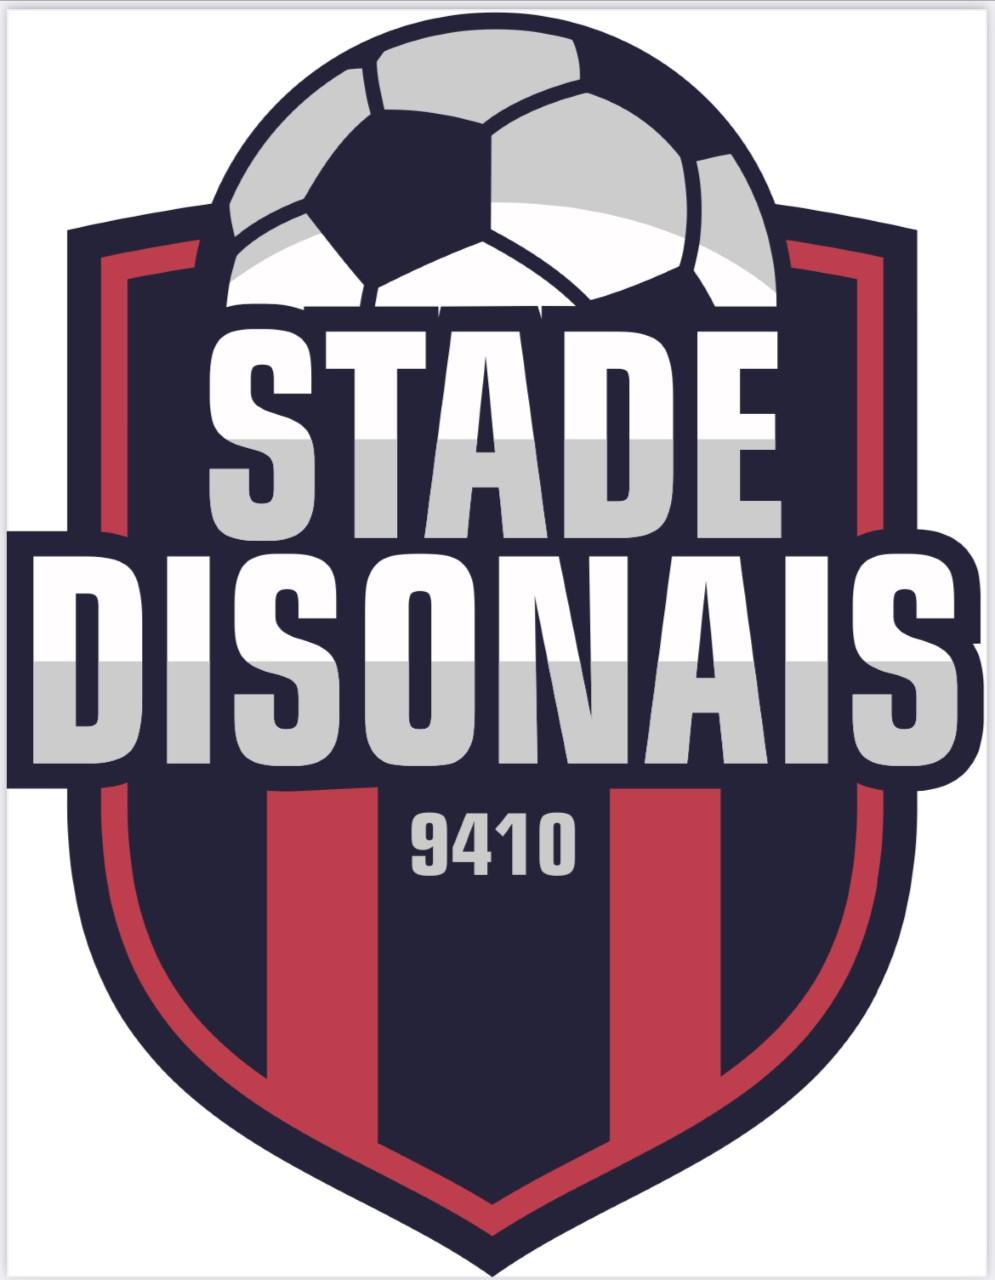 1 - Stade Disonais